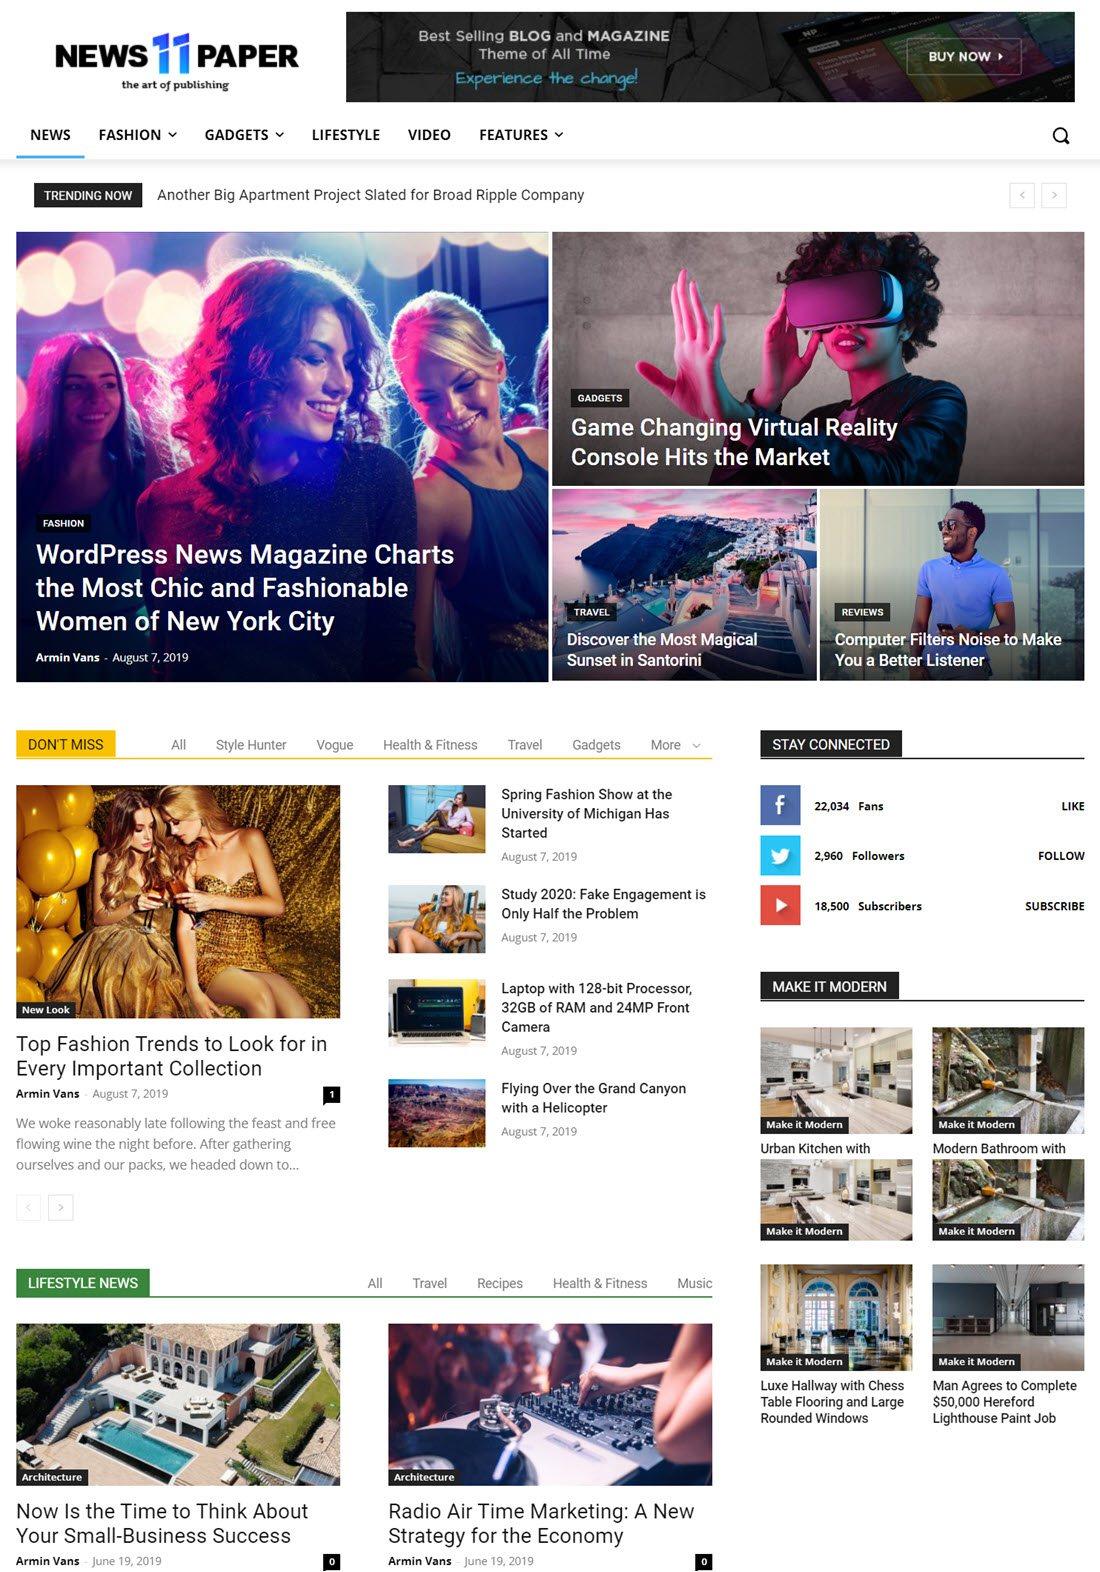 Newspaper News & WooCommerce WordPress Theme Screenshot